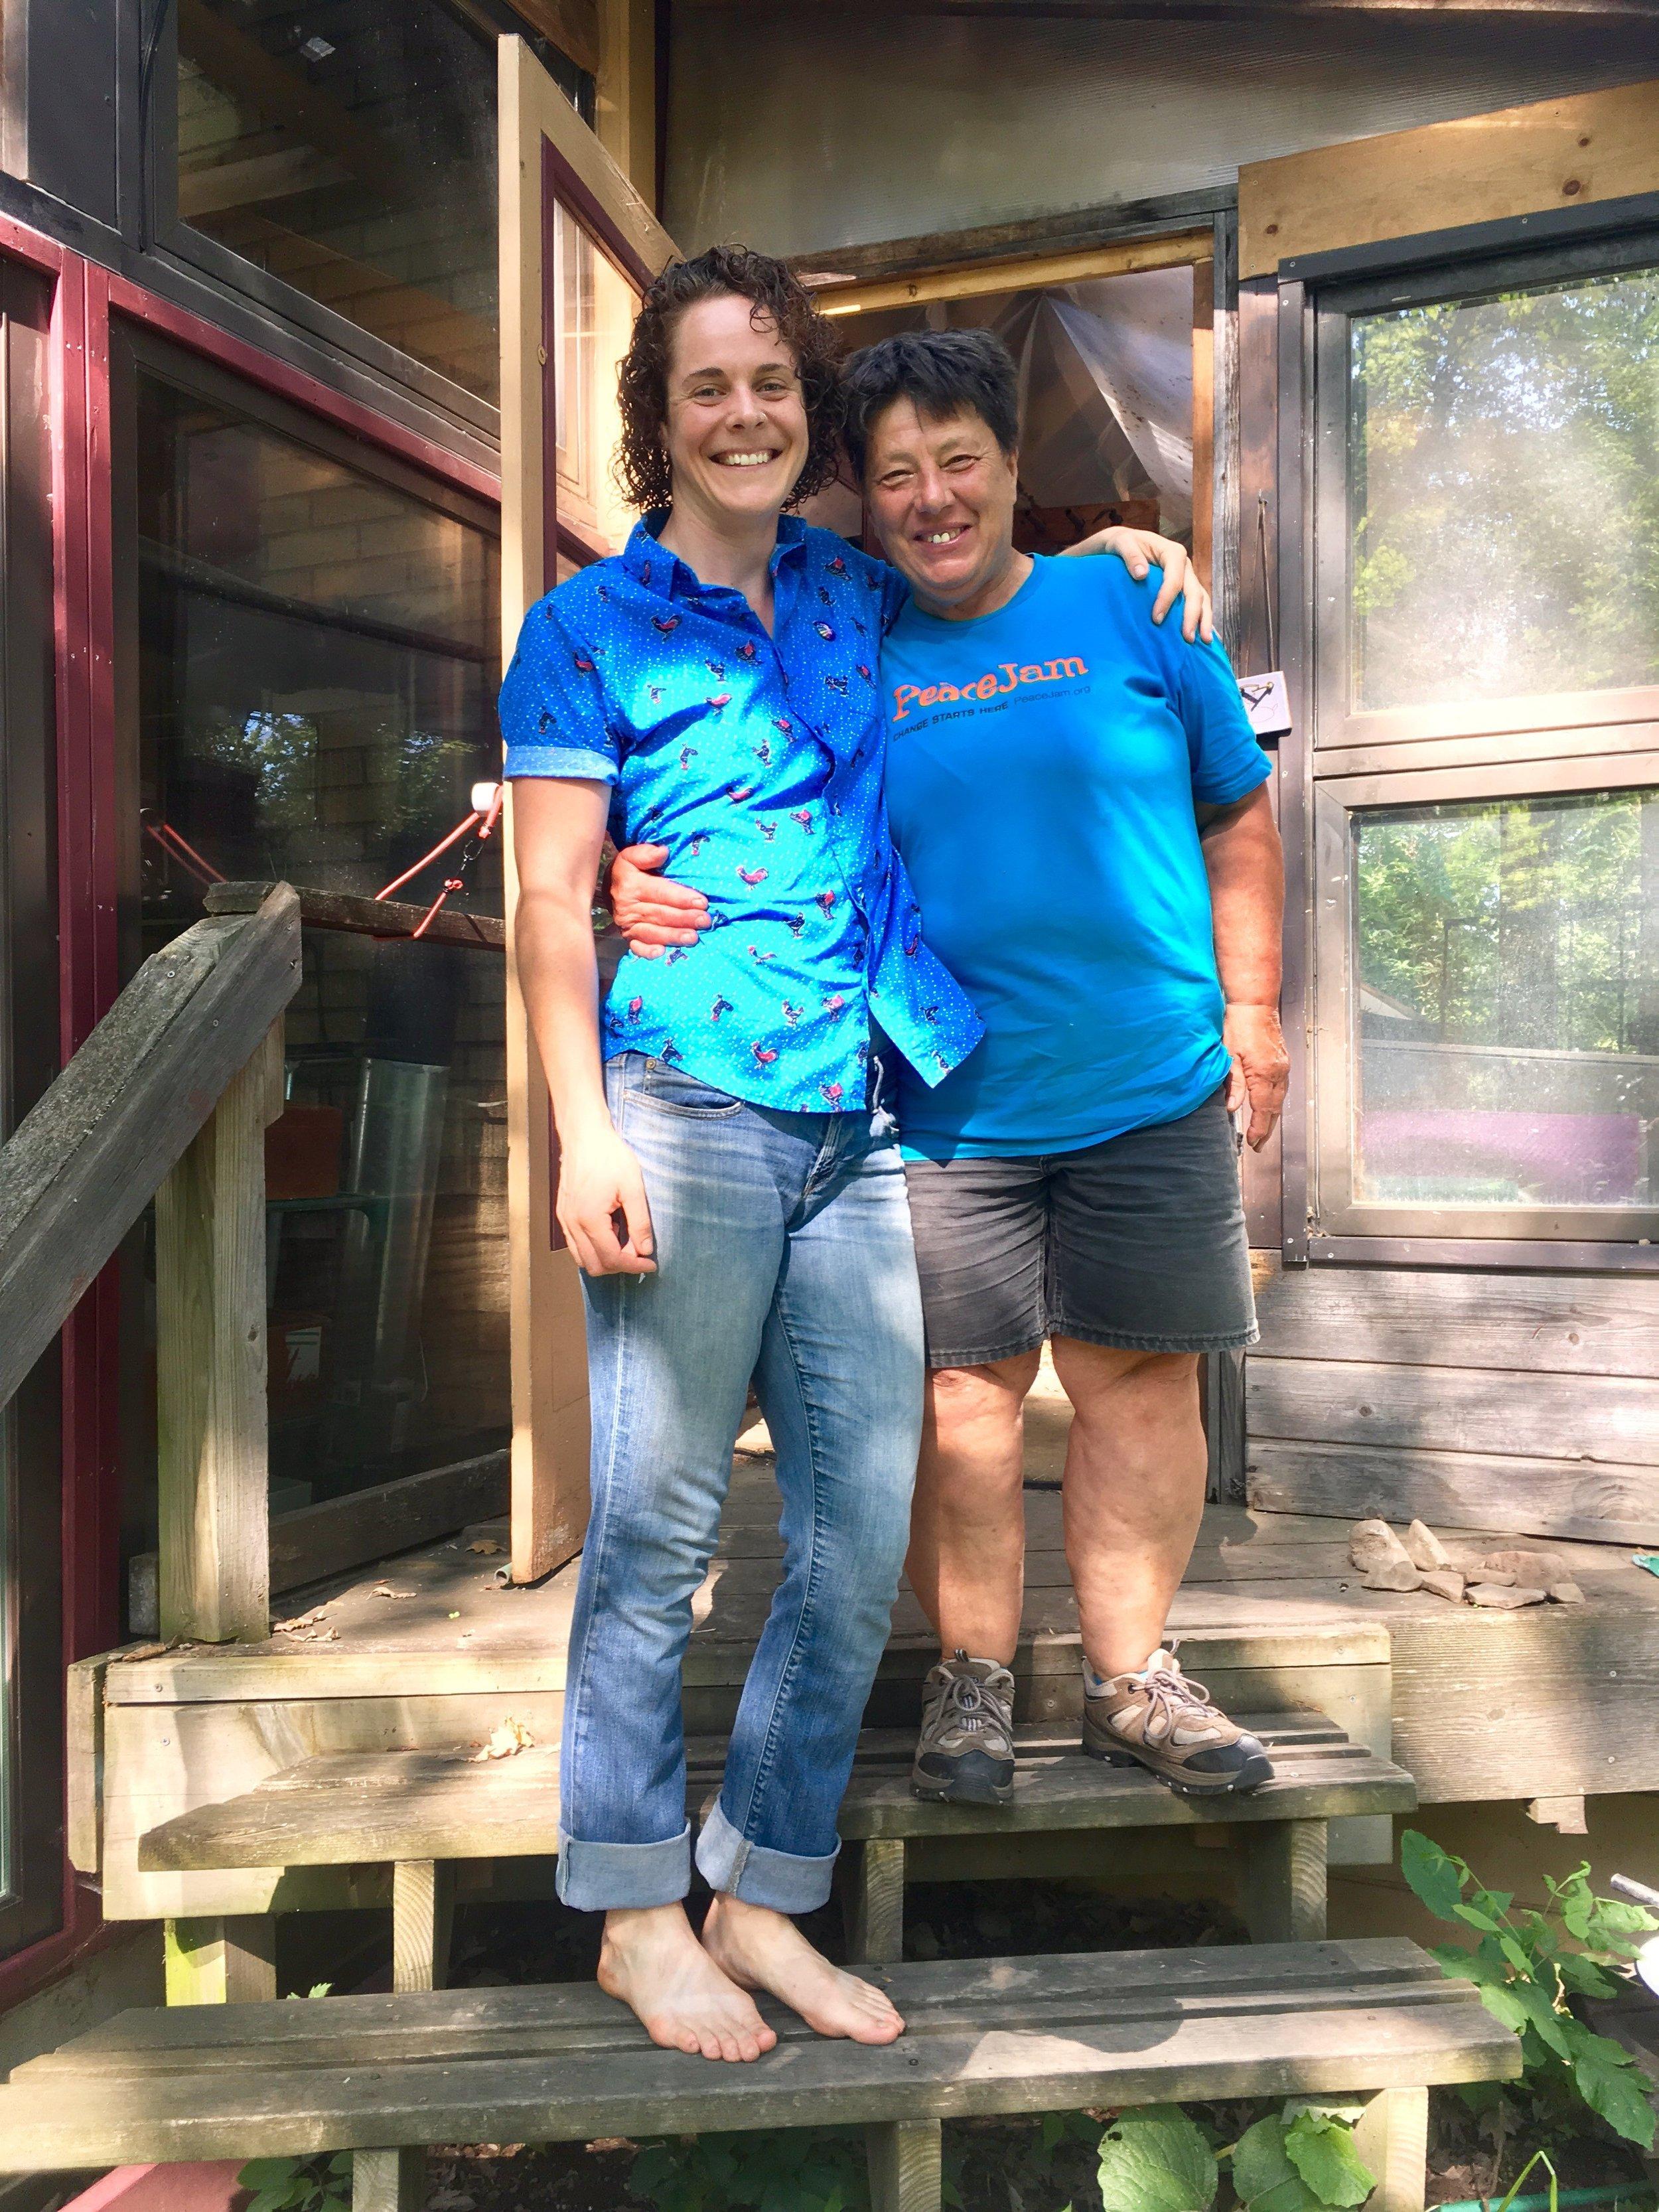 Jacyln with Nett on her Minnestota Farm, image supplied.